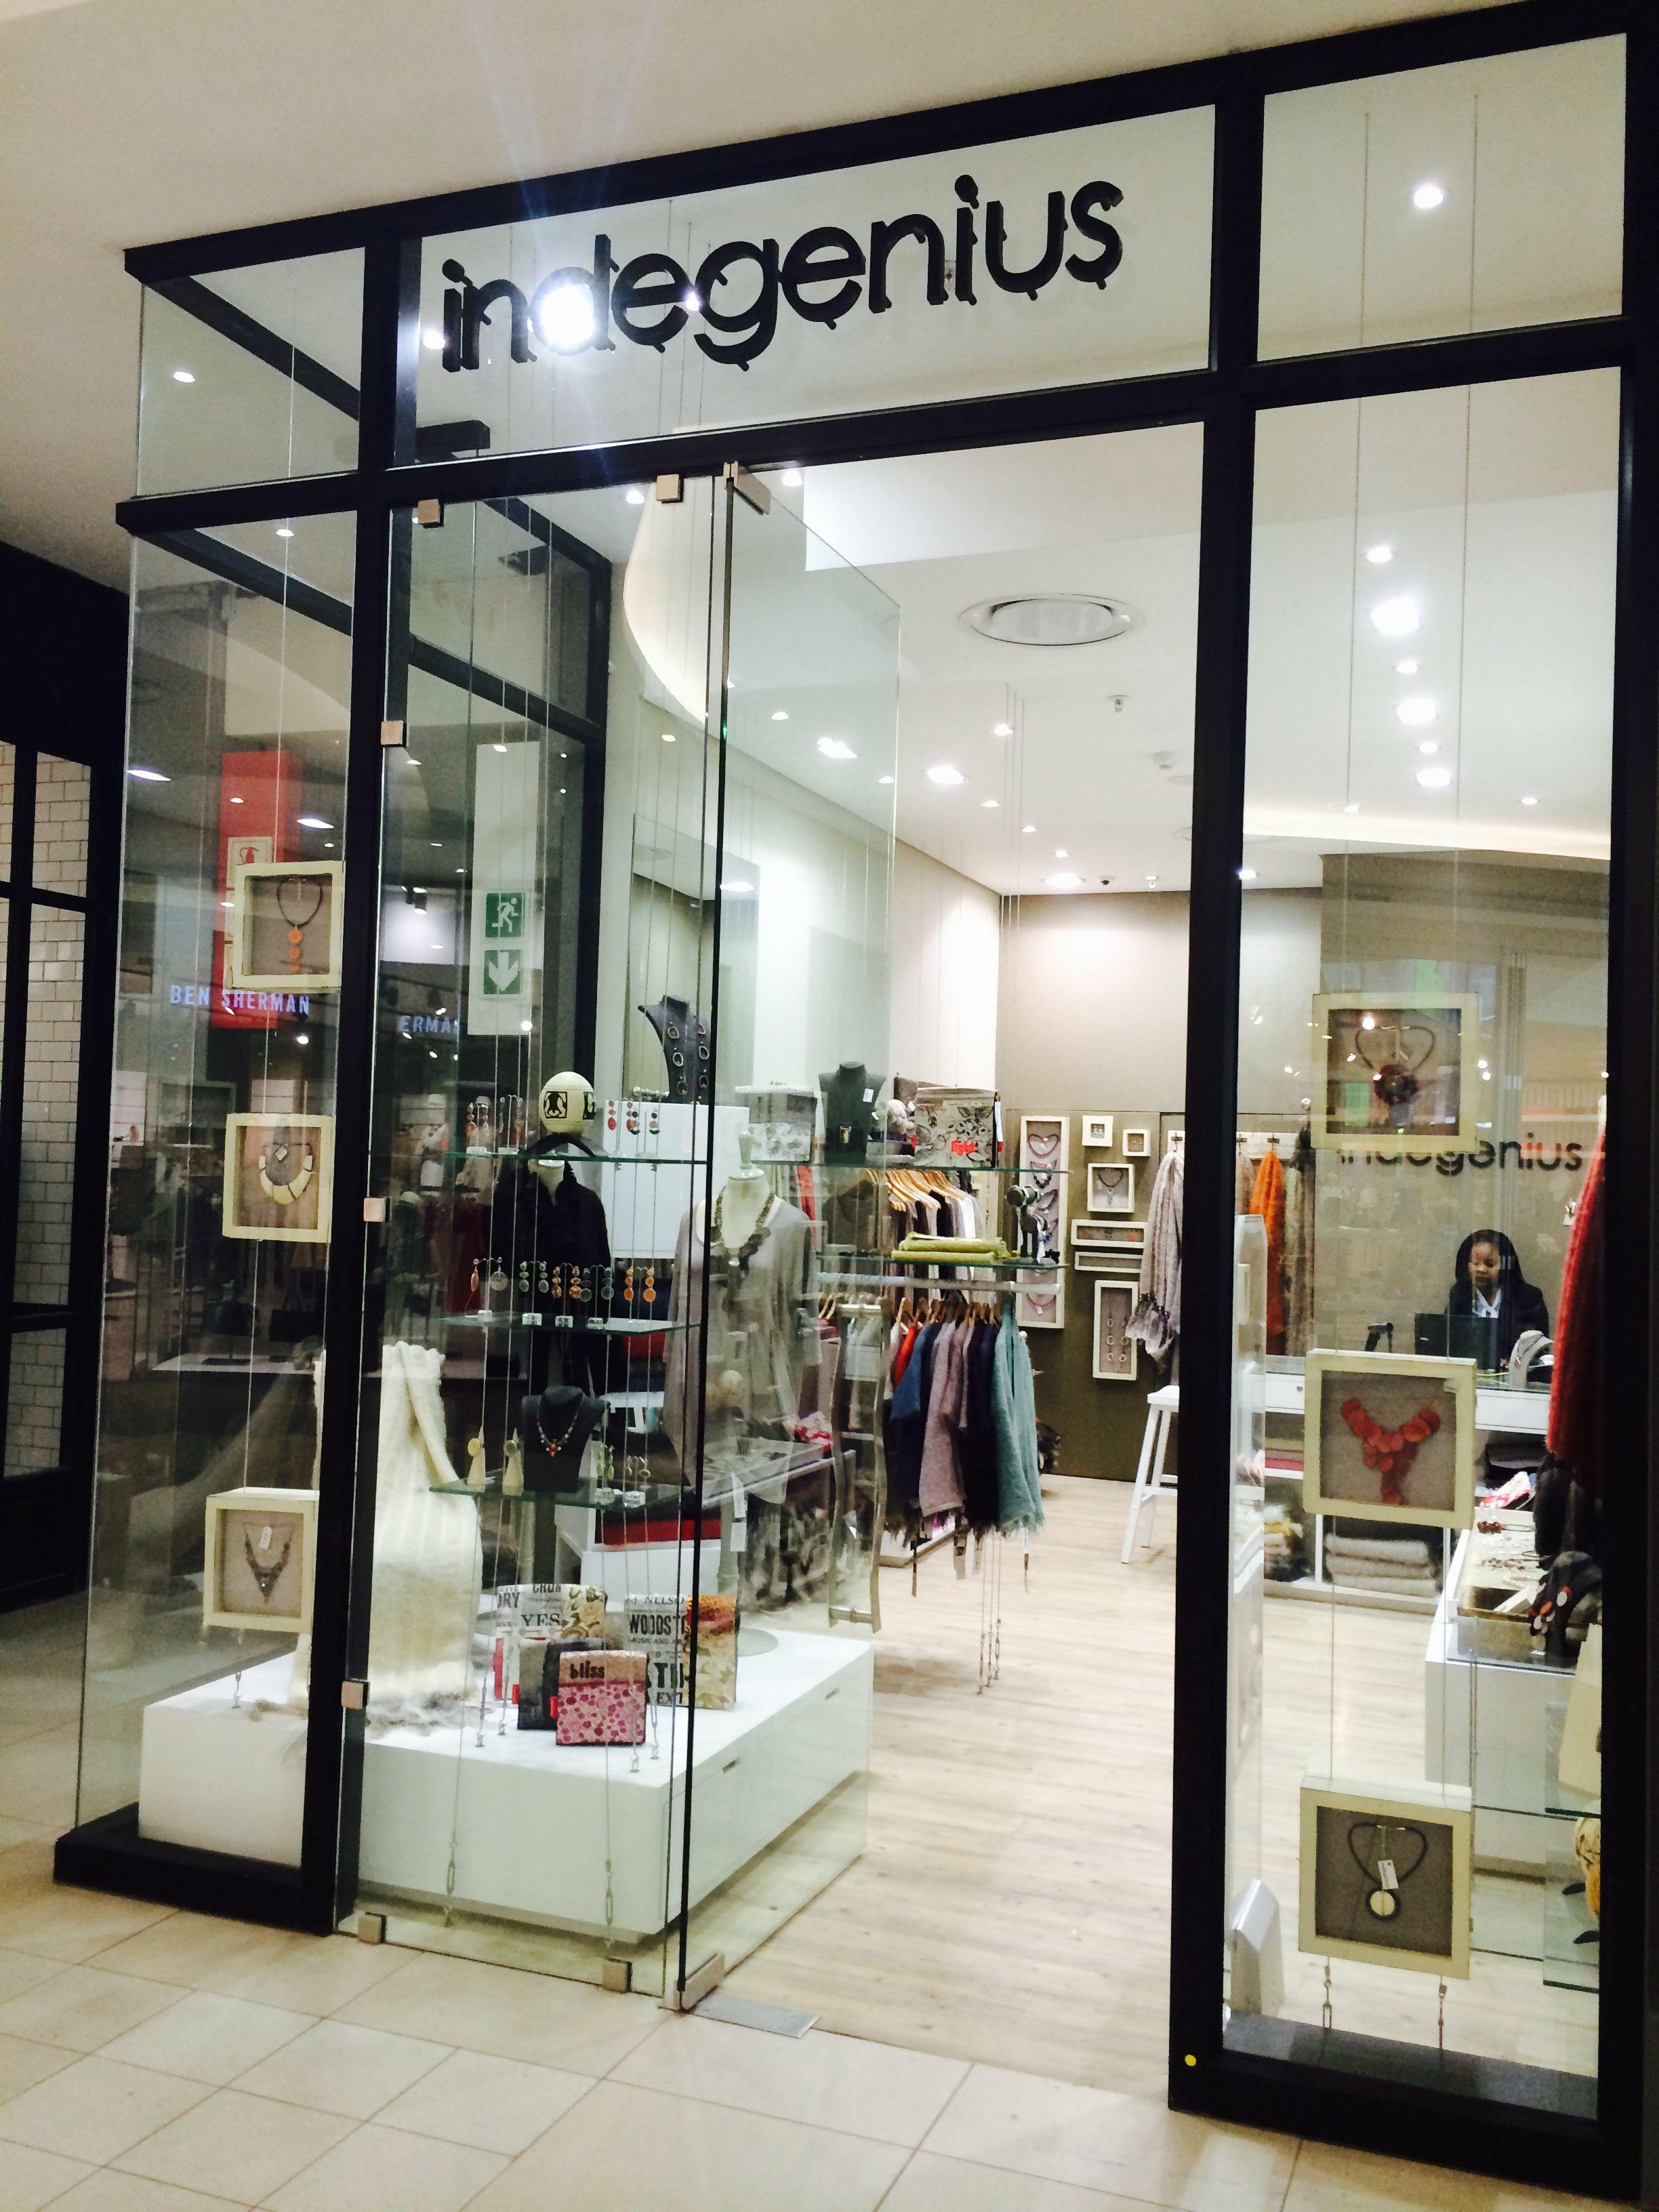 IndegeniusZa Store Rosebank